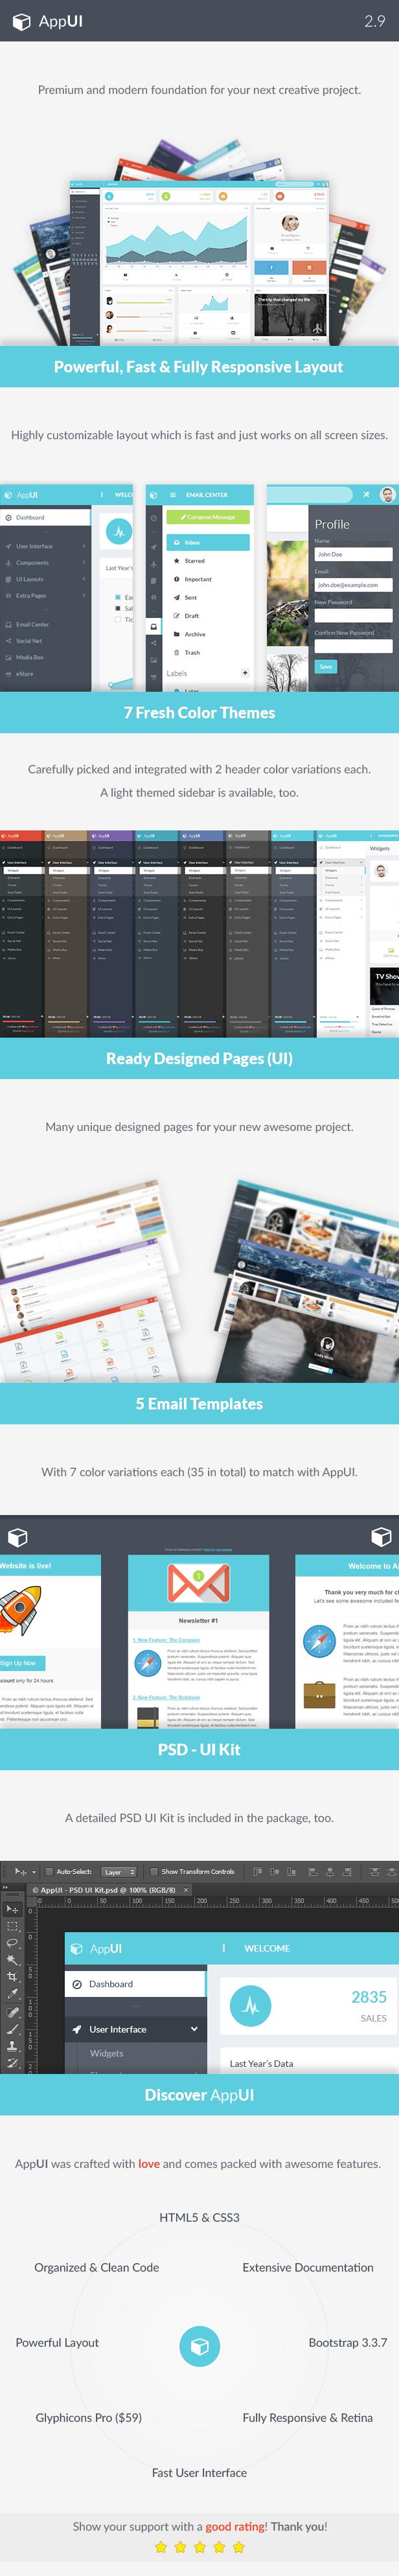 AppUI - Web App Bootstrap Admin Template - 8